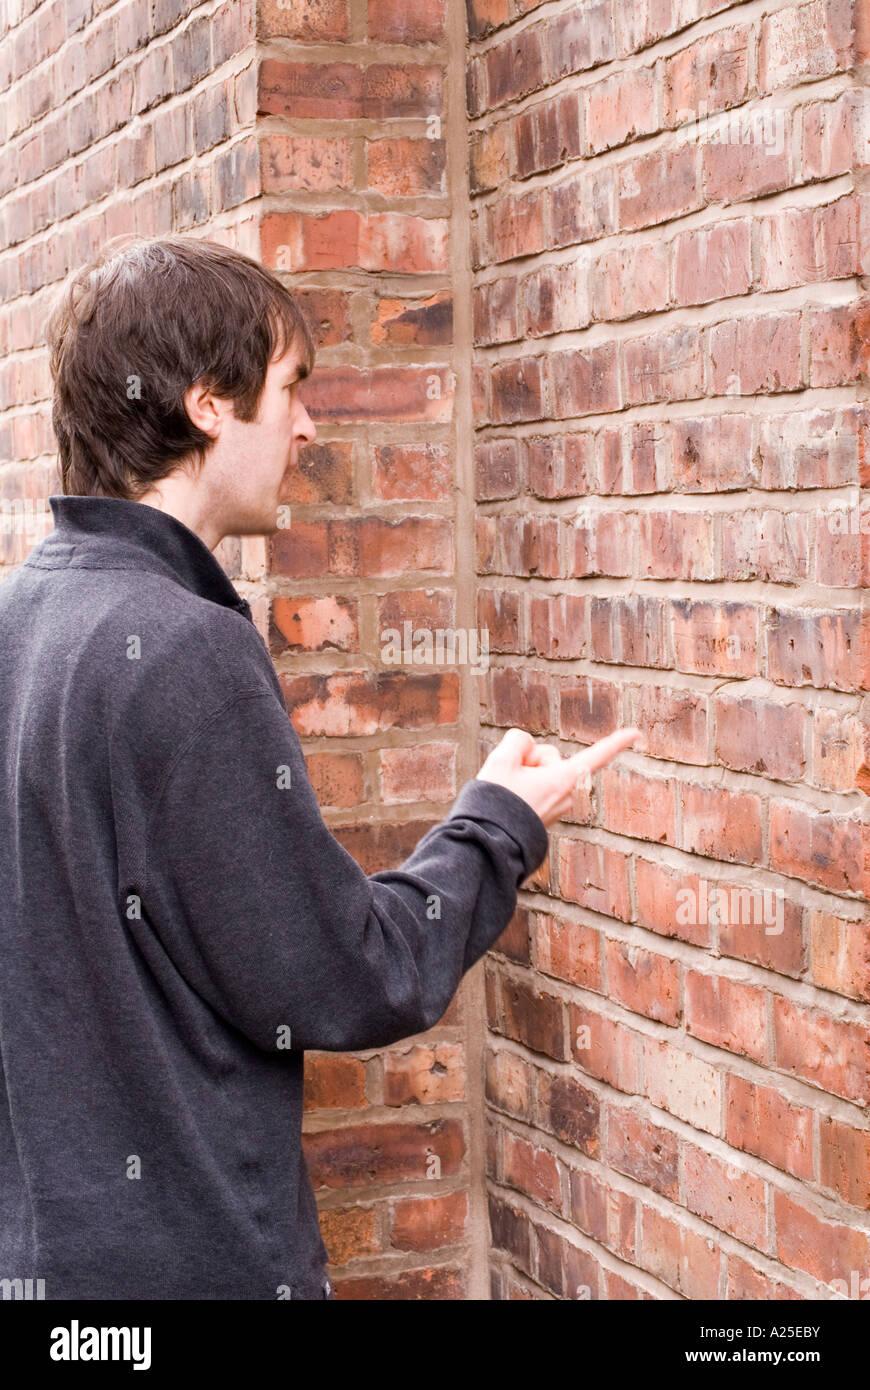 Talking To A Brick Wall Stock Photos Amp Talking To A Brick